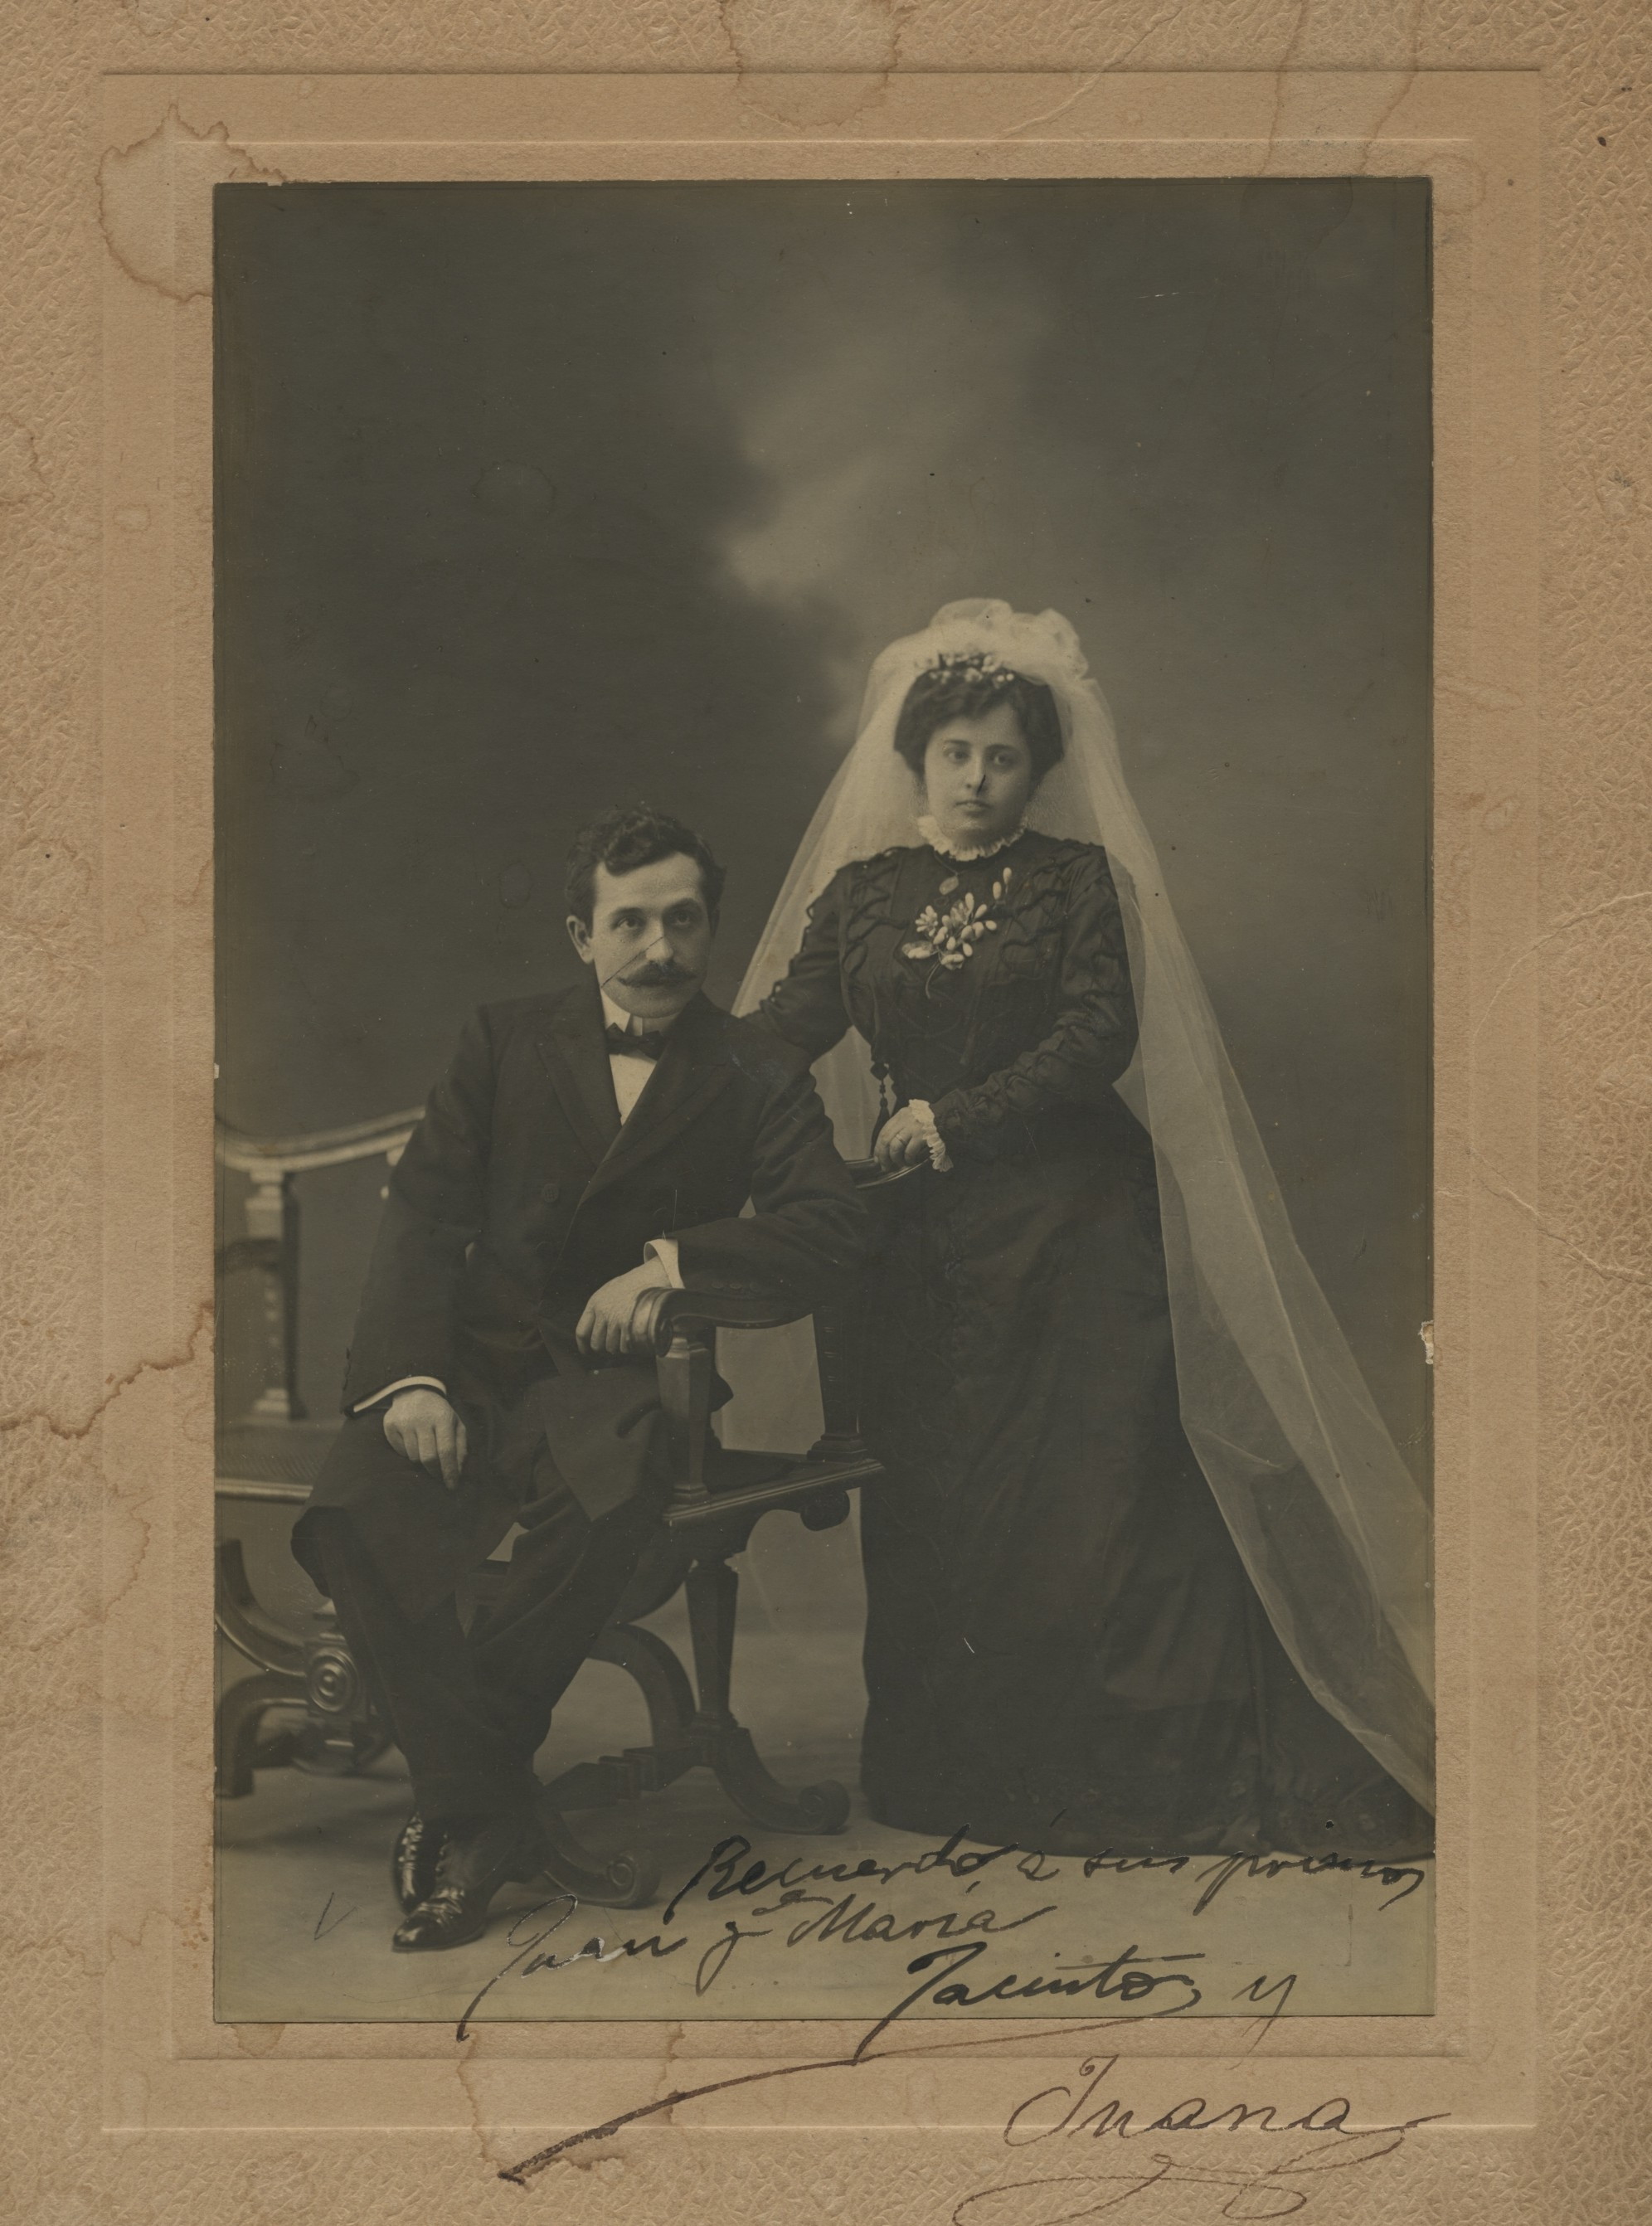 1909. Boda de Jacinto Higueras Fuentes con Juana Cátedra Segura